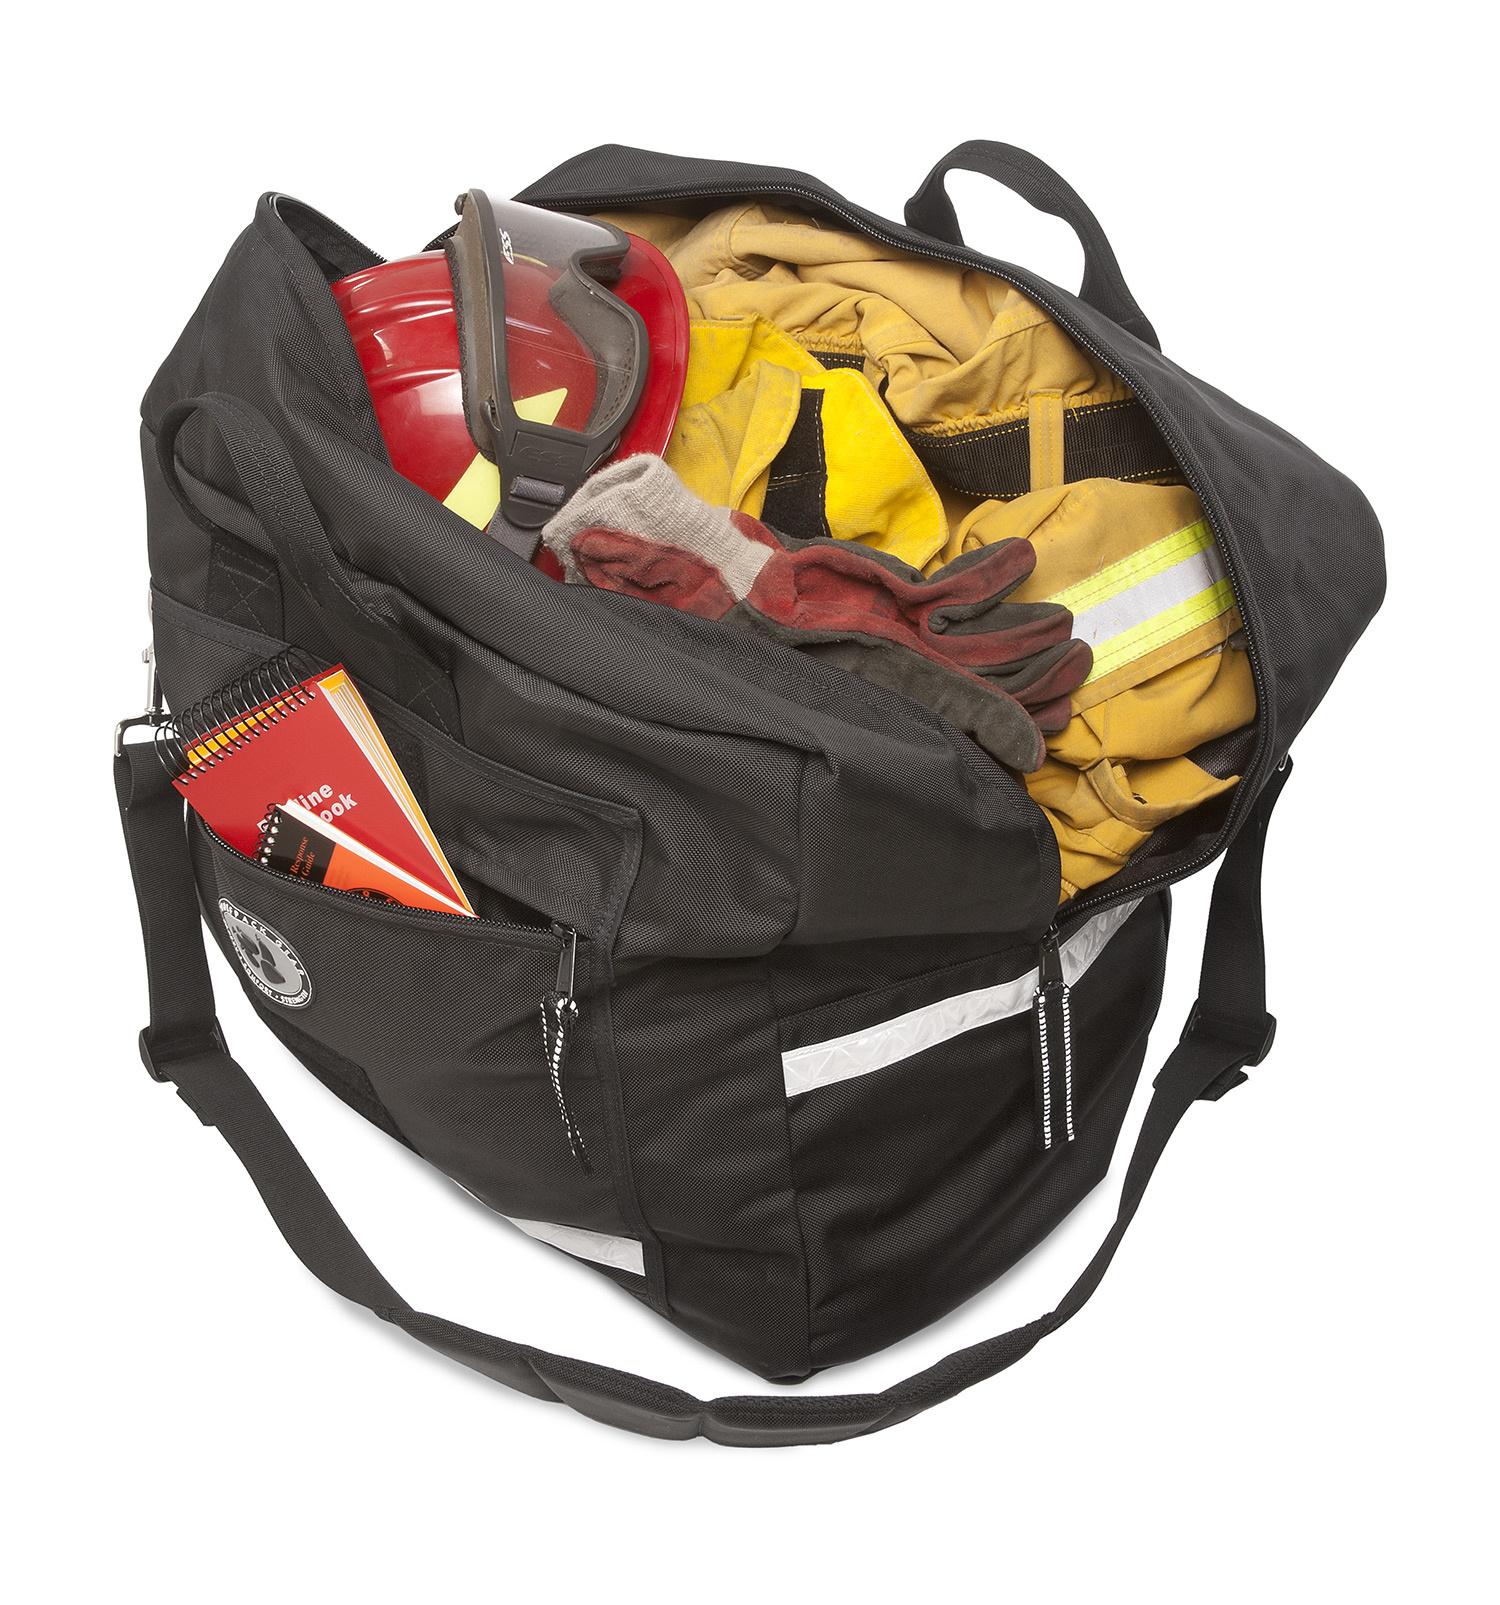 WOLFPACK PPE Duffel Bag